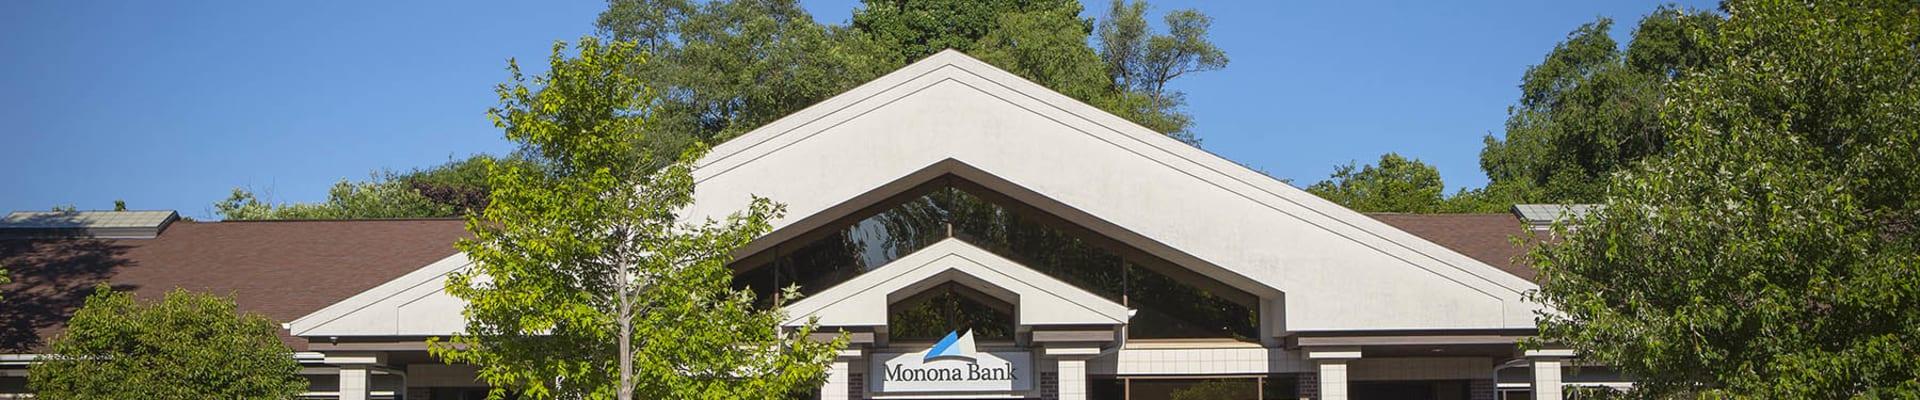 Monona Bank Monona Drive Wisconsin